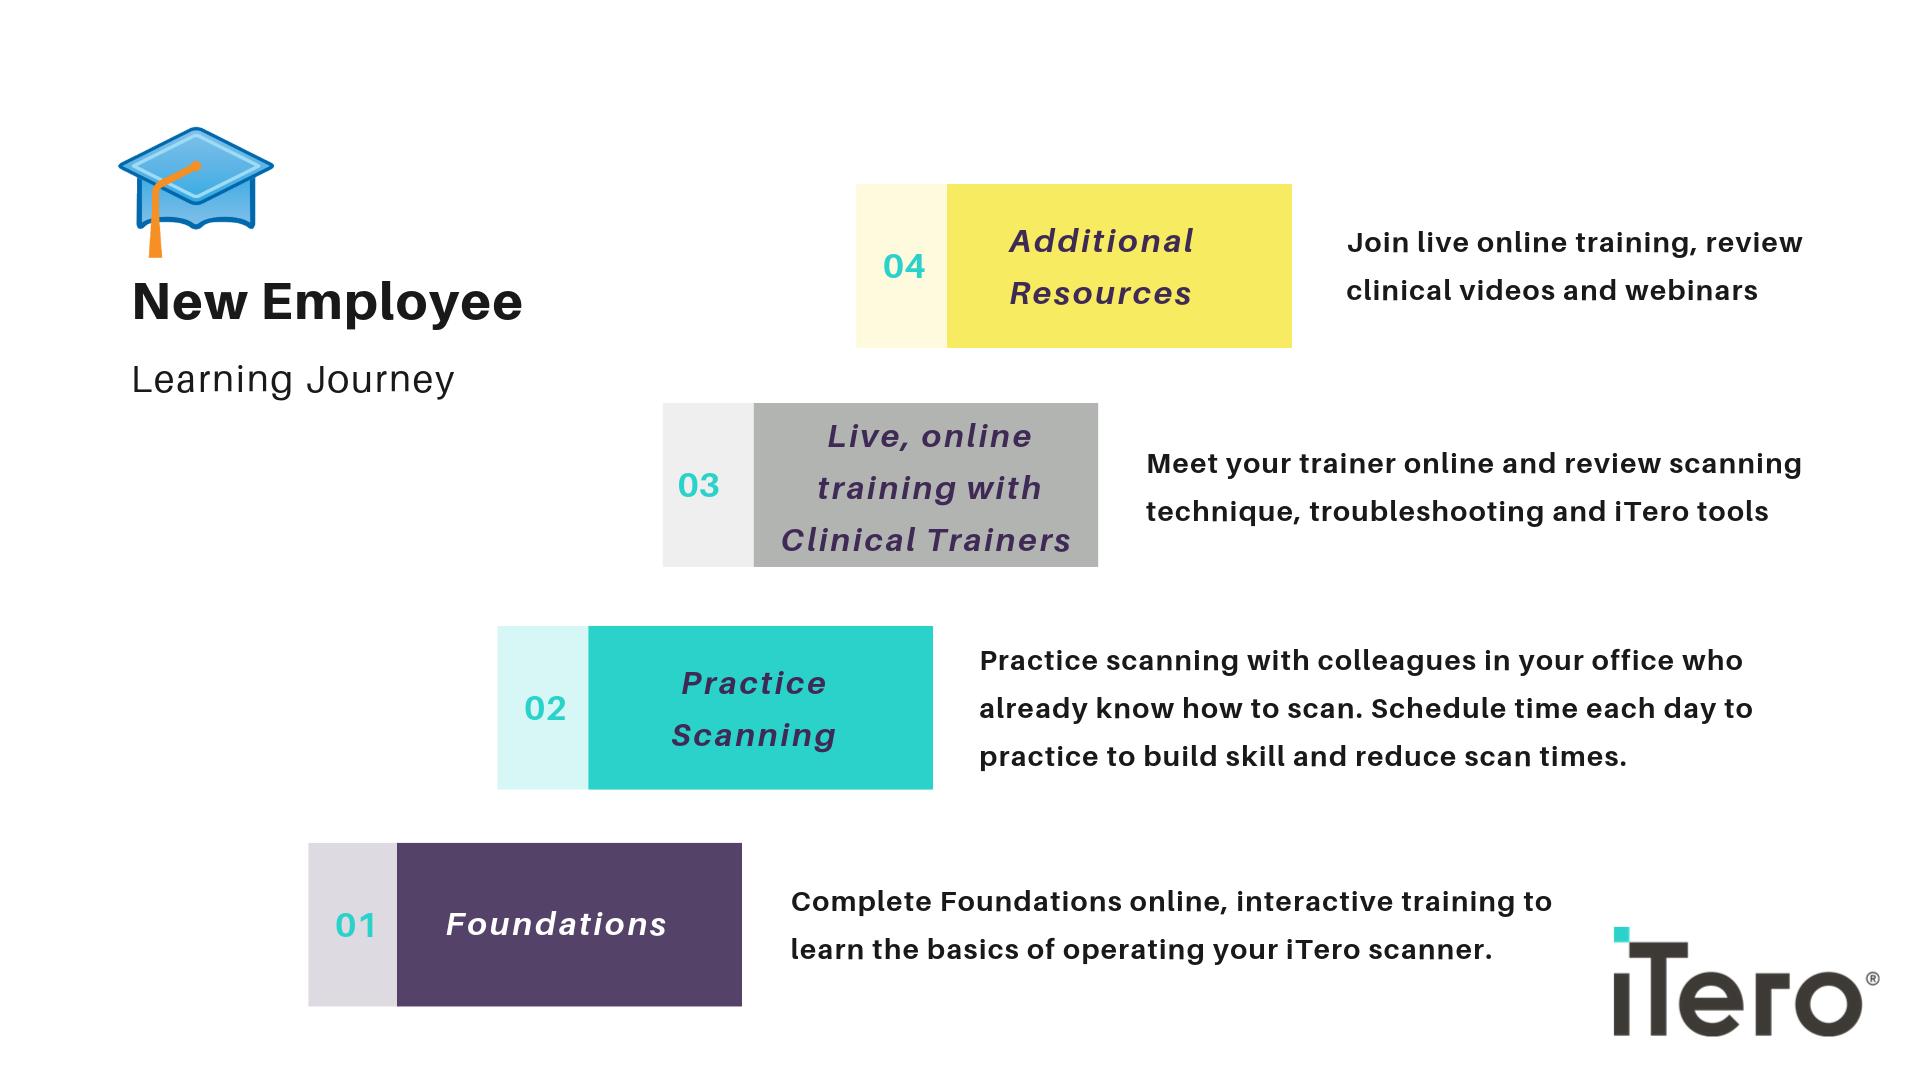 Training Curriculum - New Employee